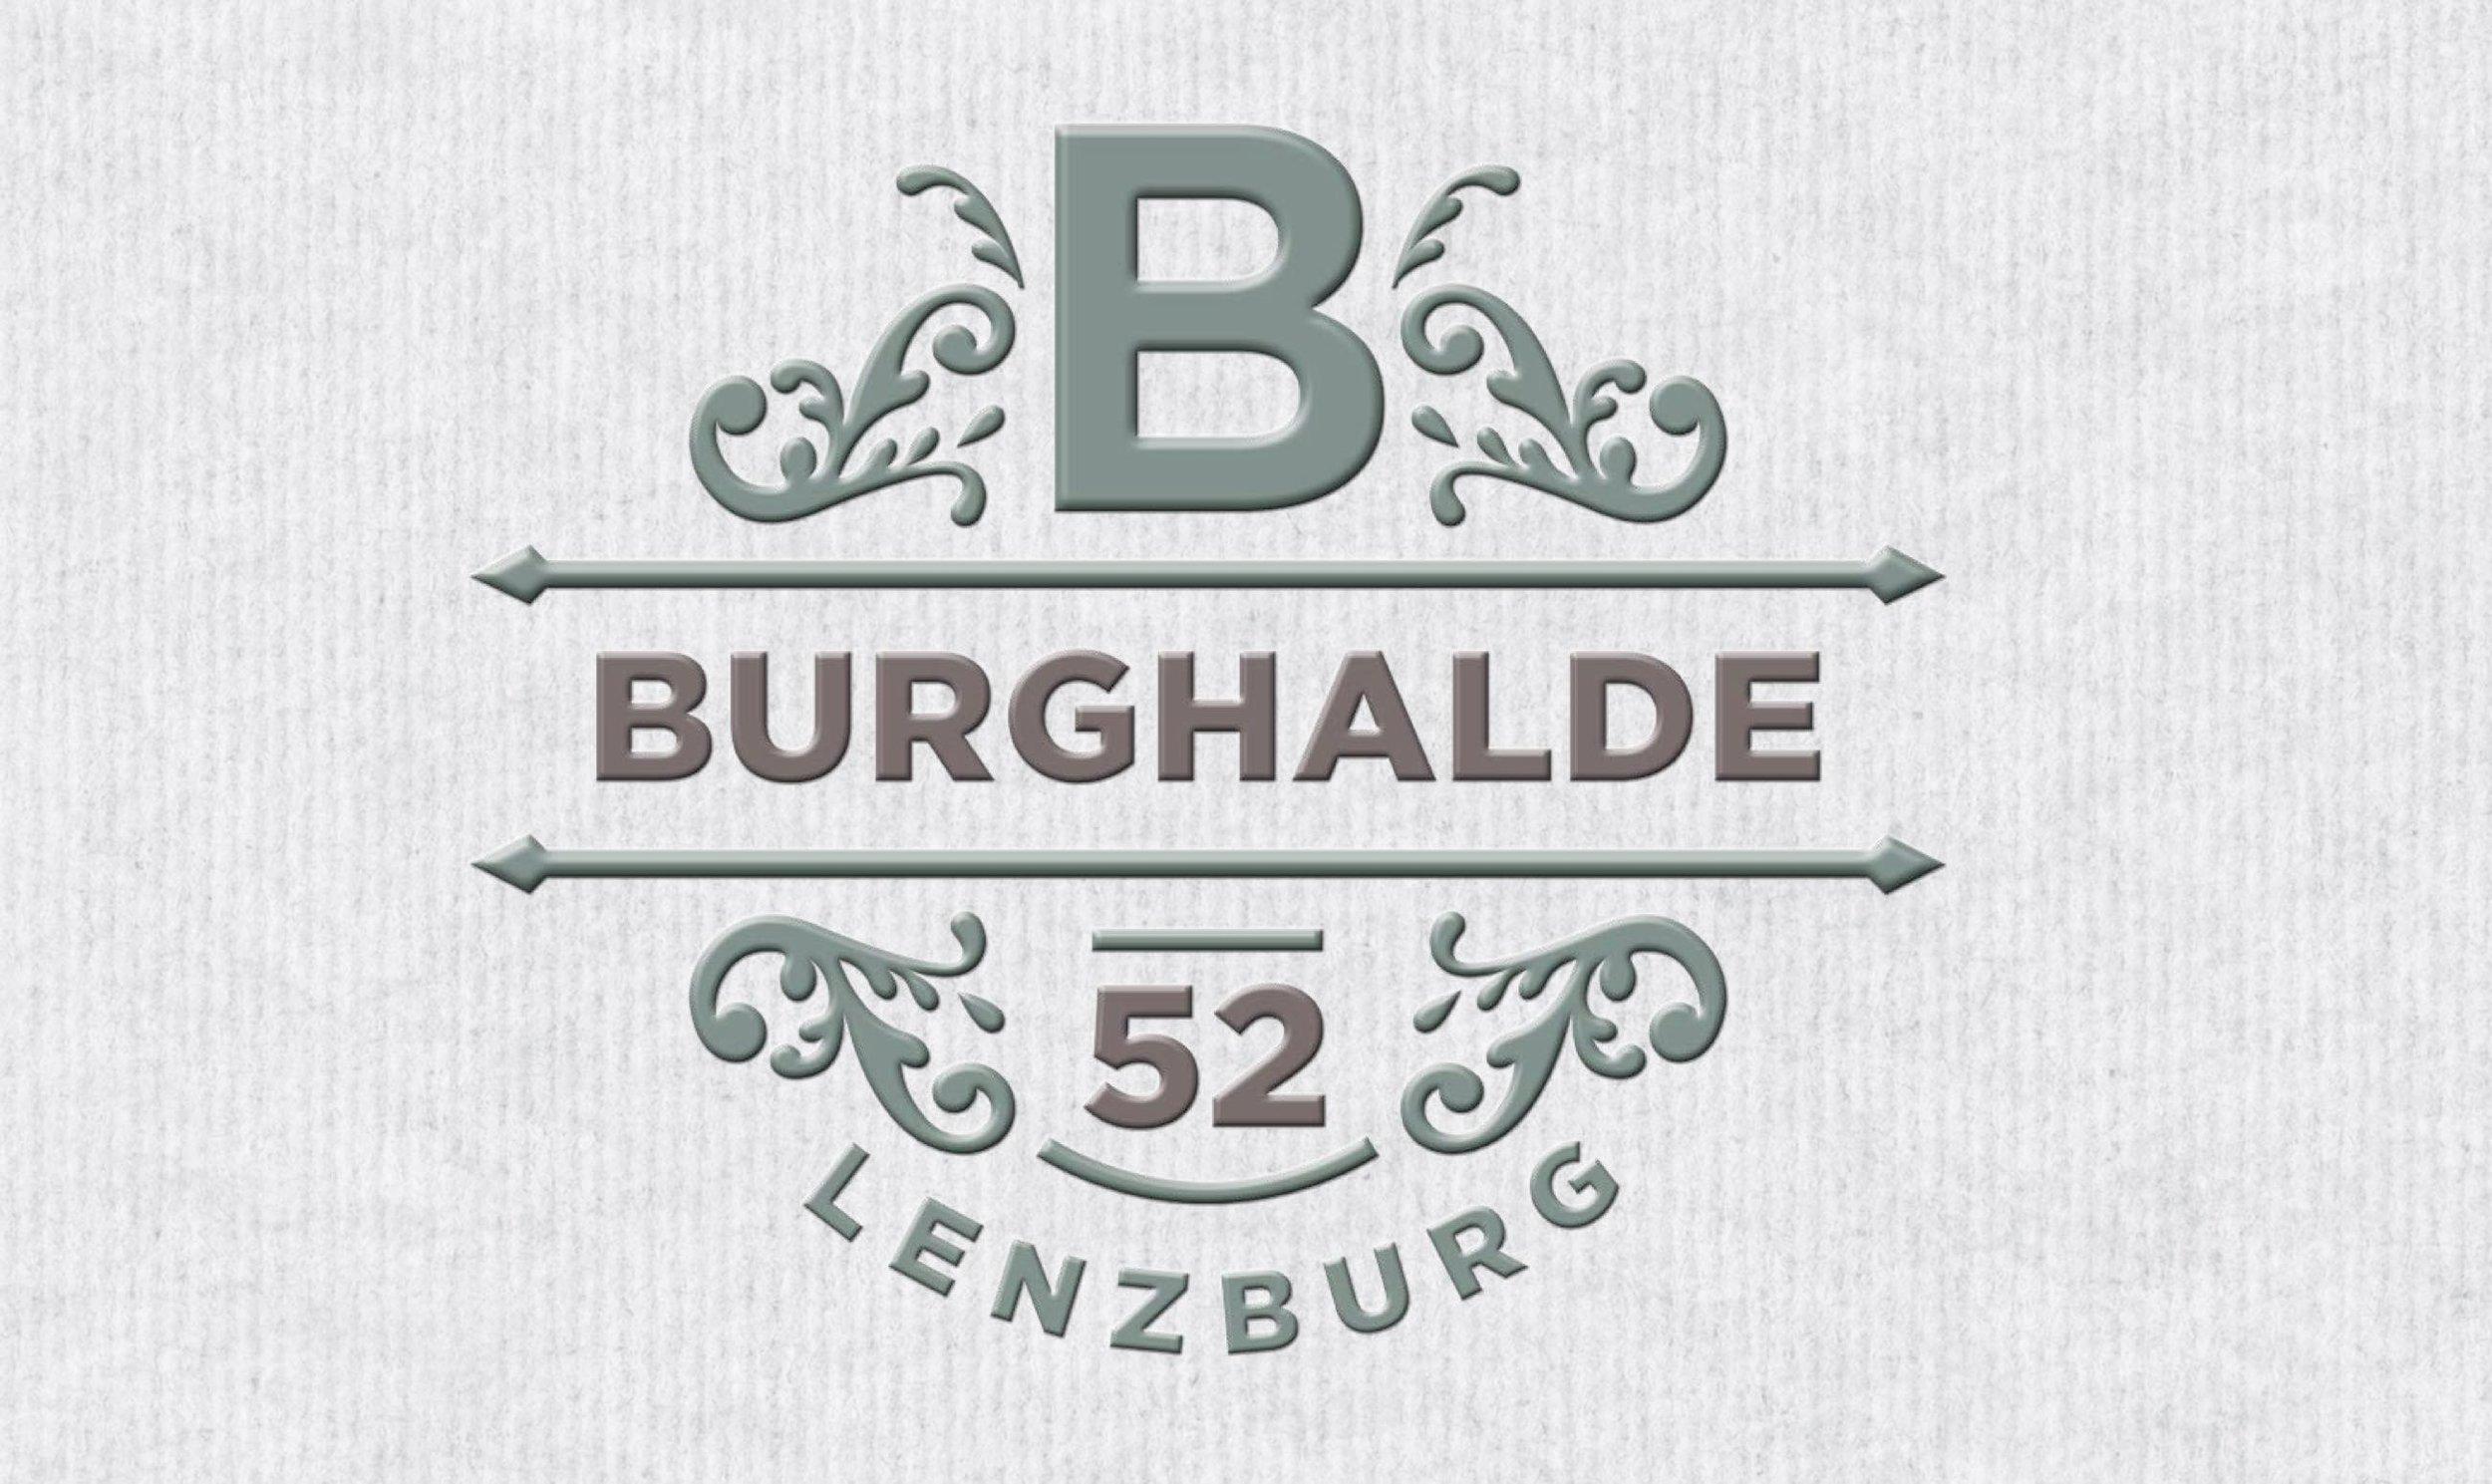 LogoBurghalde.jpg